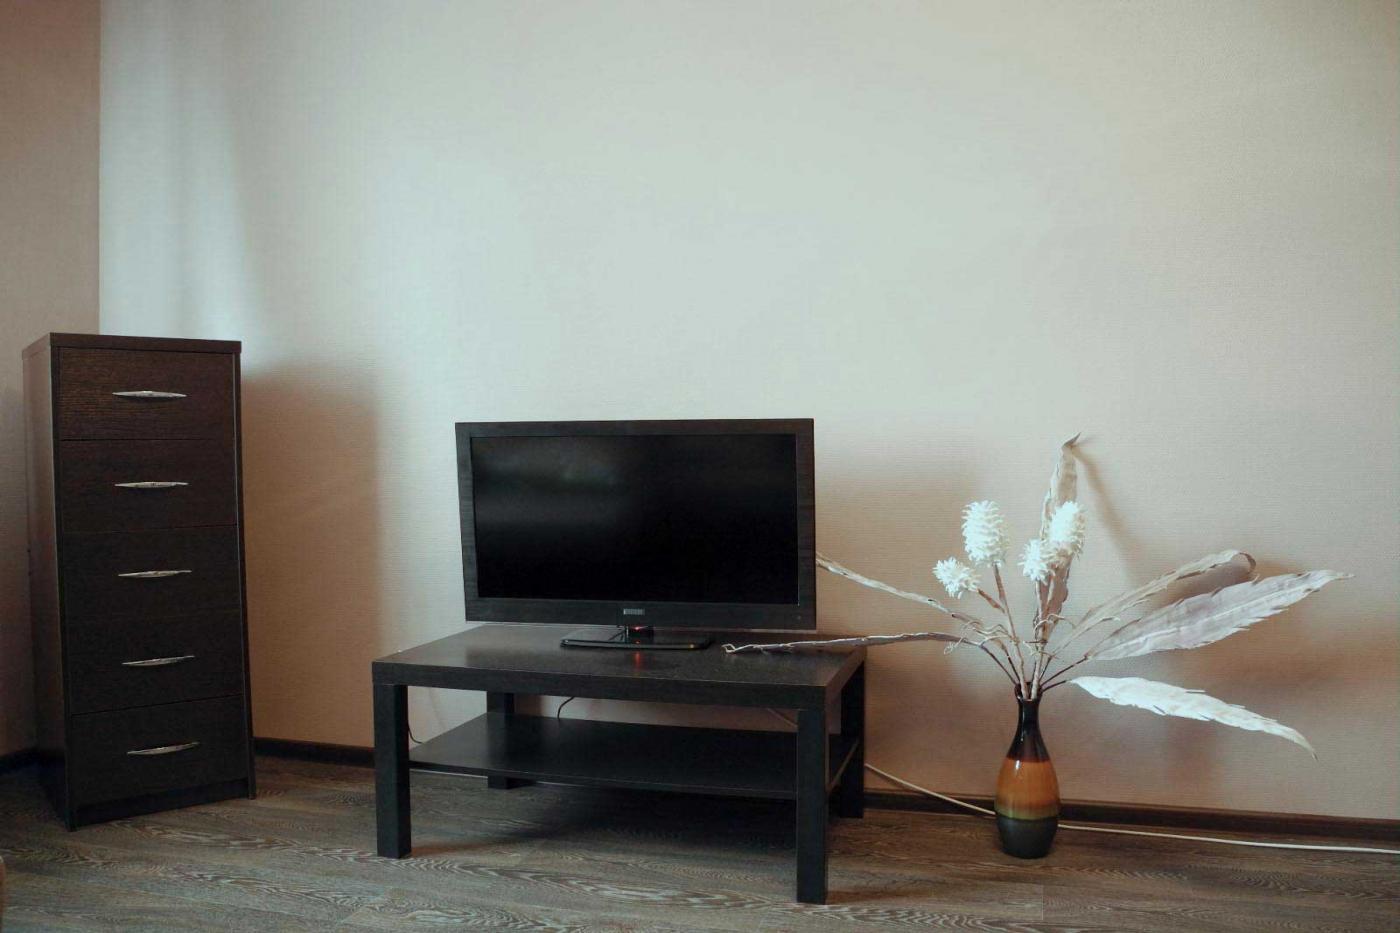 1-комнатная квартира посуточно (вариант № 3875), ул. Ленинский проспект, фото № 3